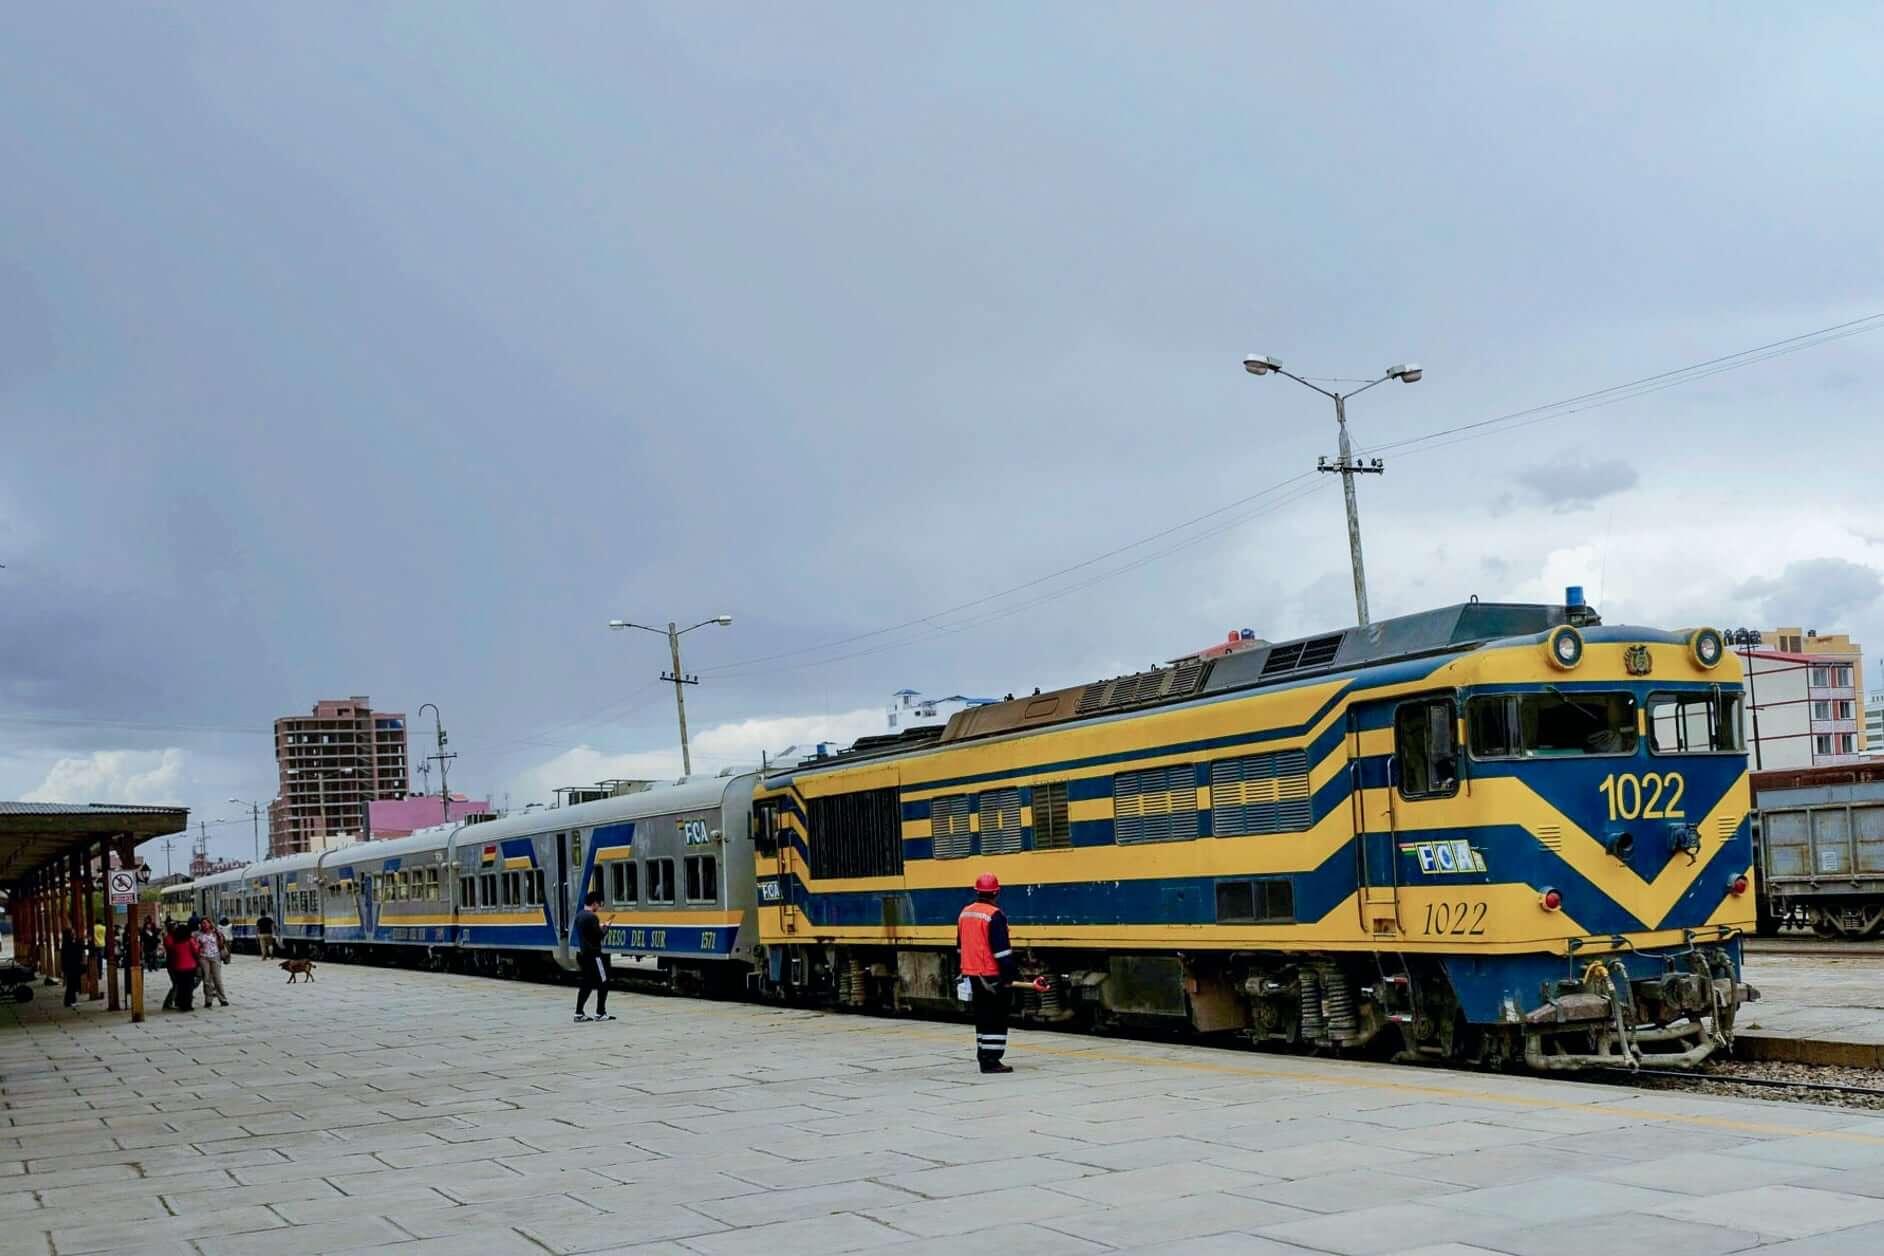 Expreso del Sur in Oruro waiting for departure to Uyuni and Villazon